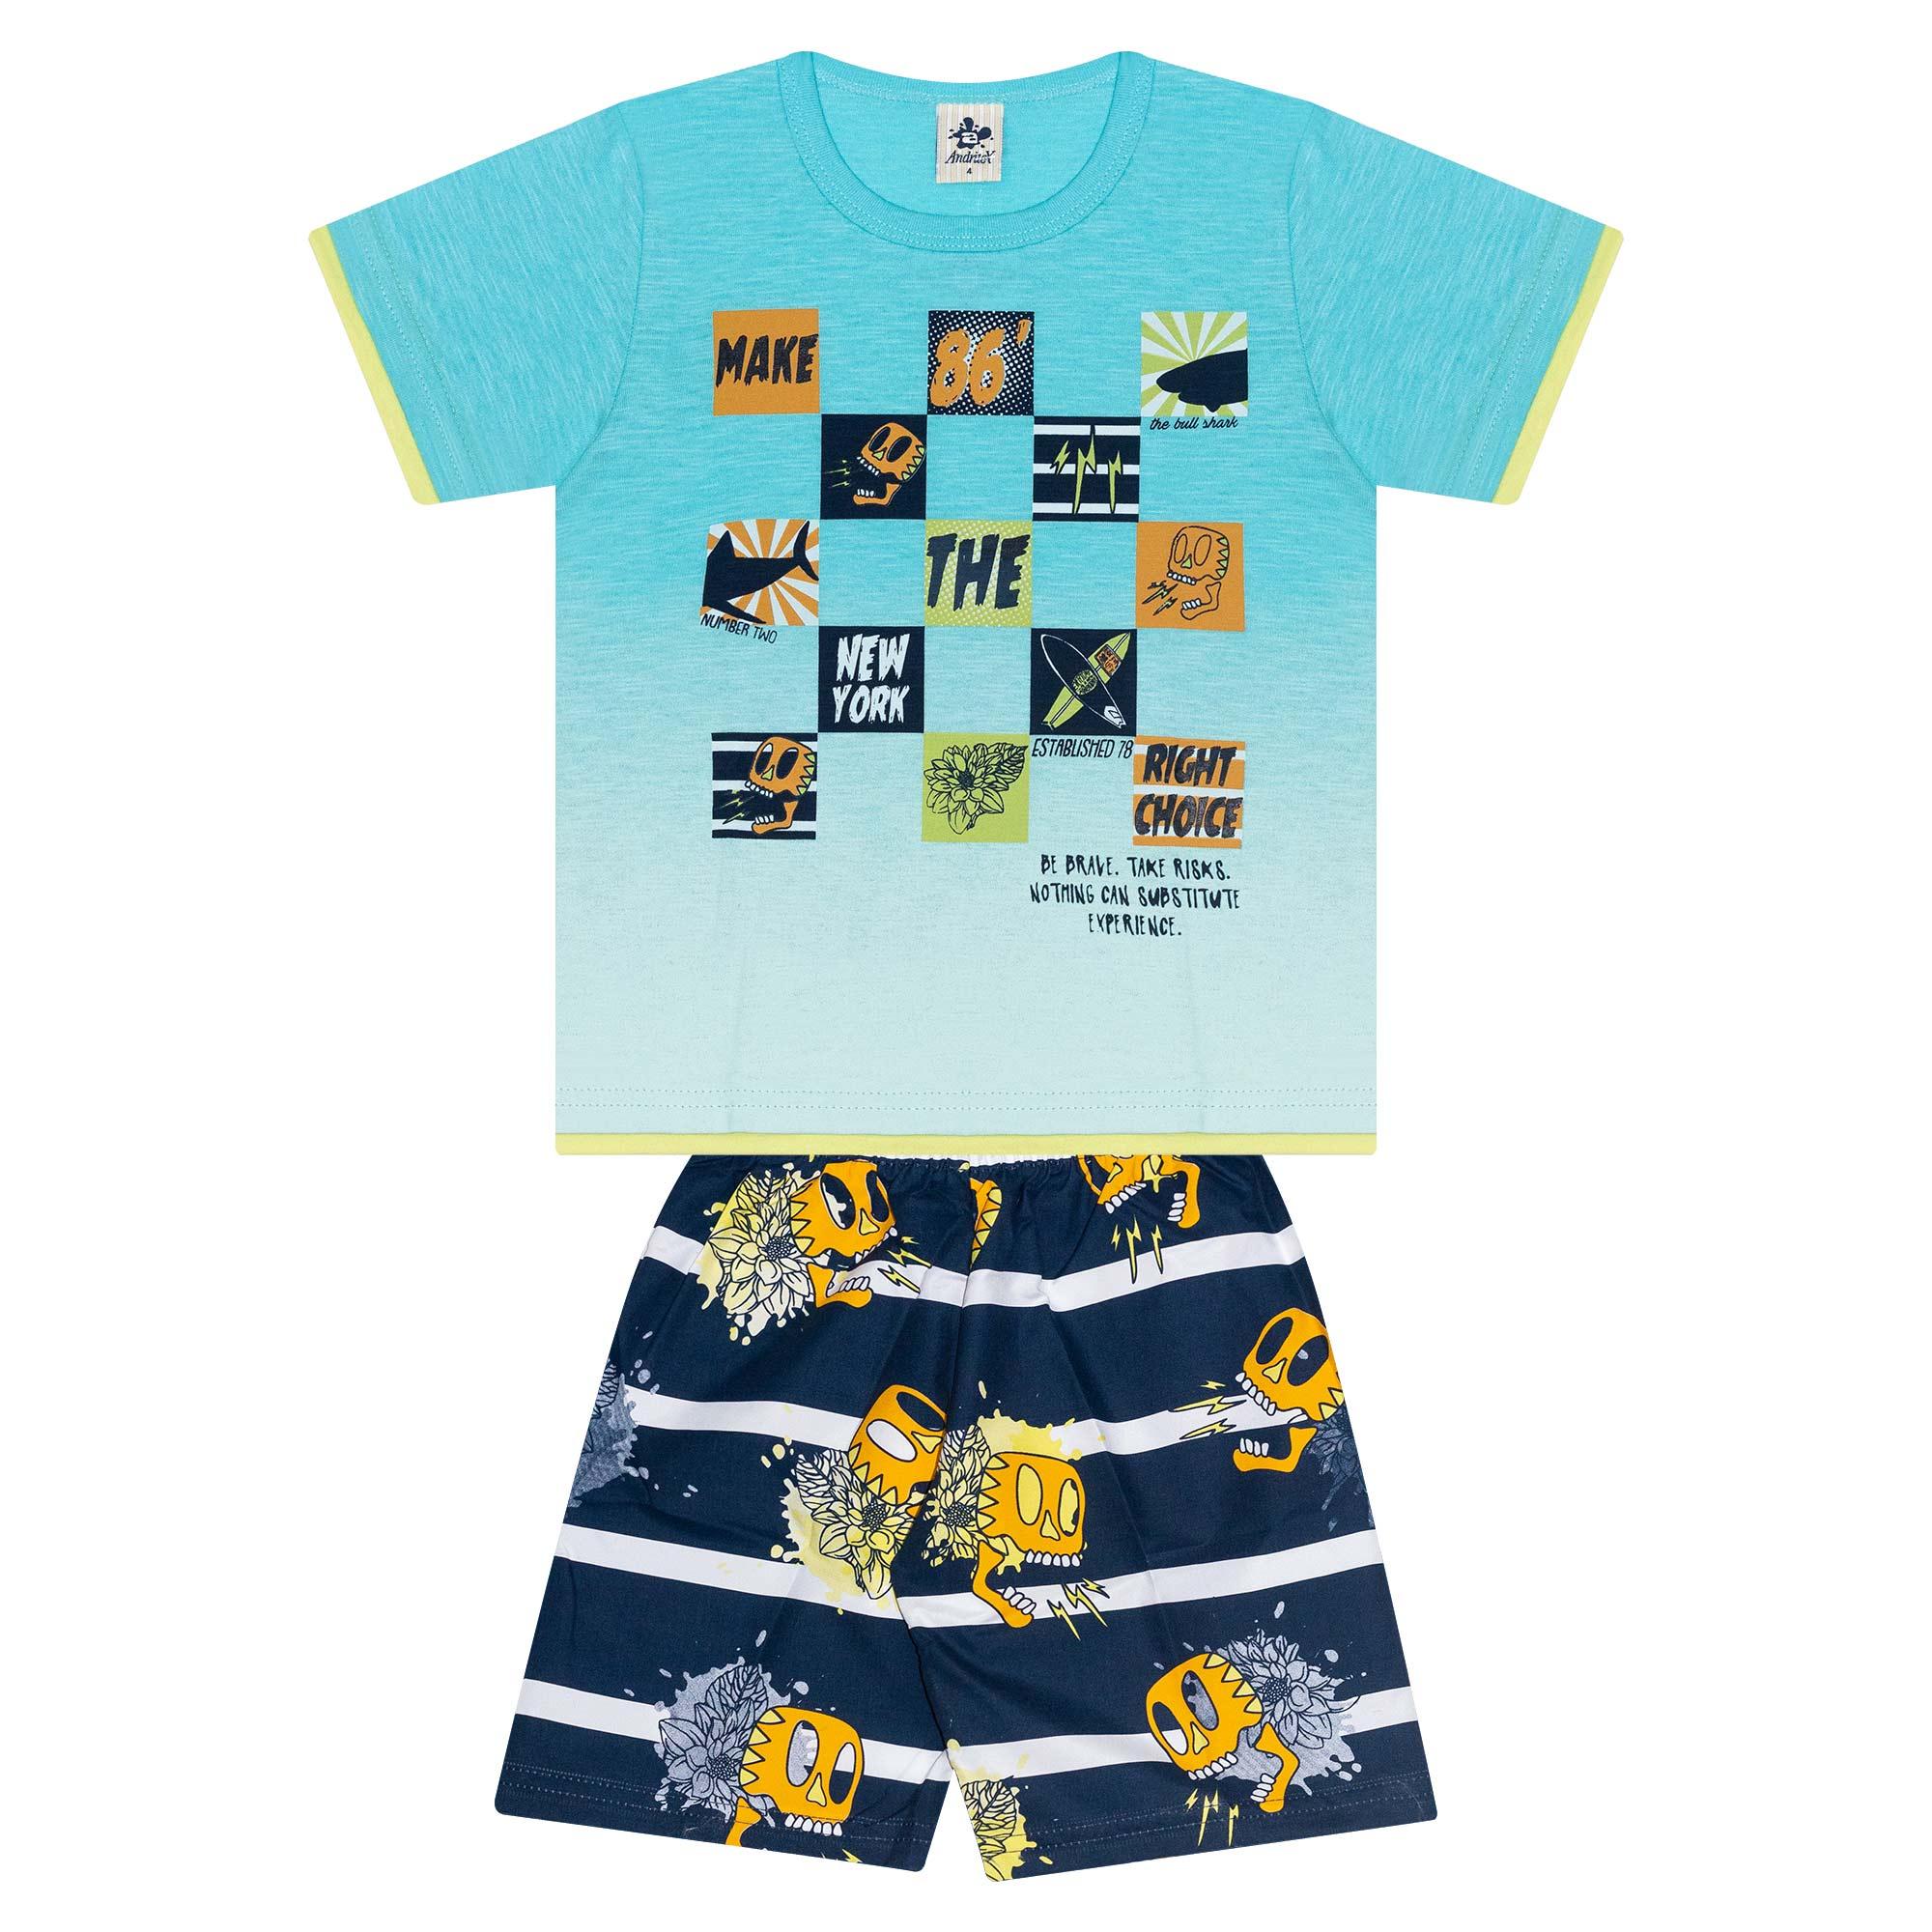 Conjunto Infantil Masculino - Ref 4908 - Azul - Andritex